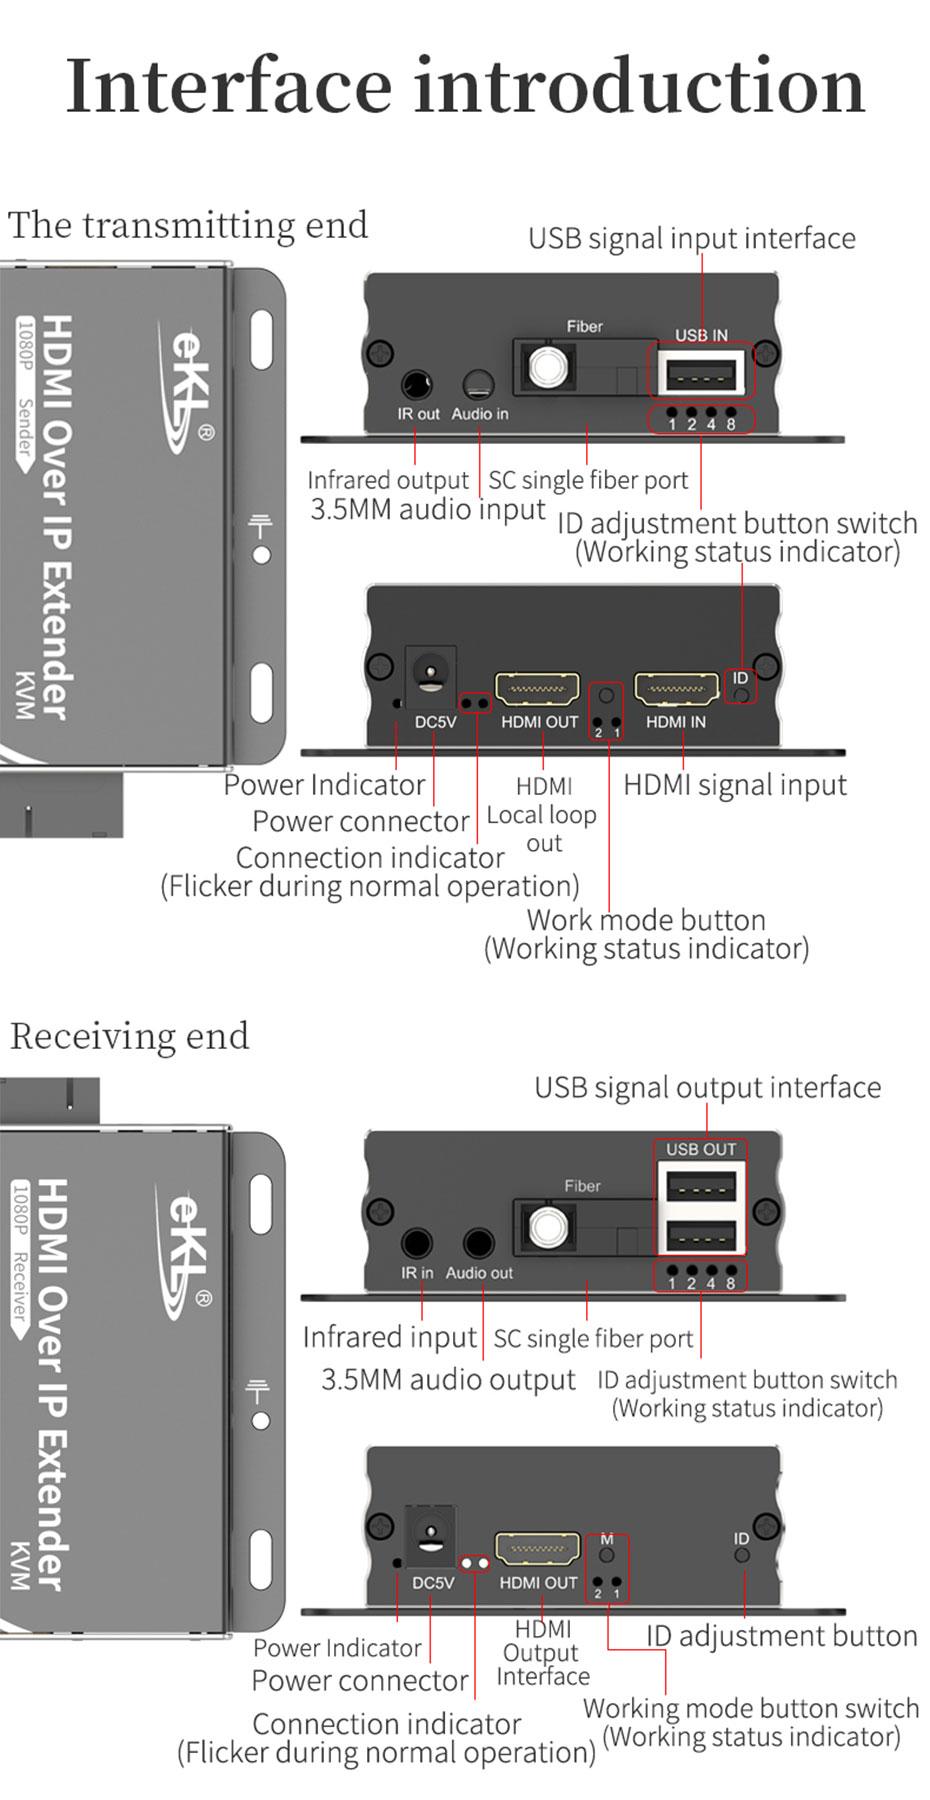 HDMI KVM optical fiber extender HE001 interface introduction